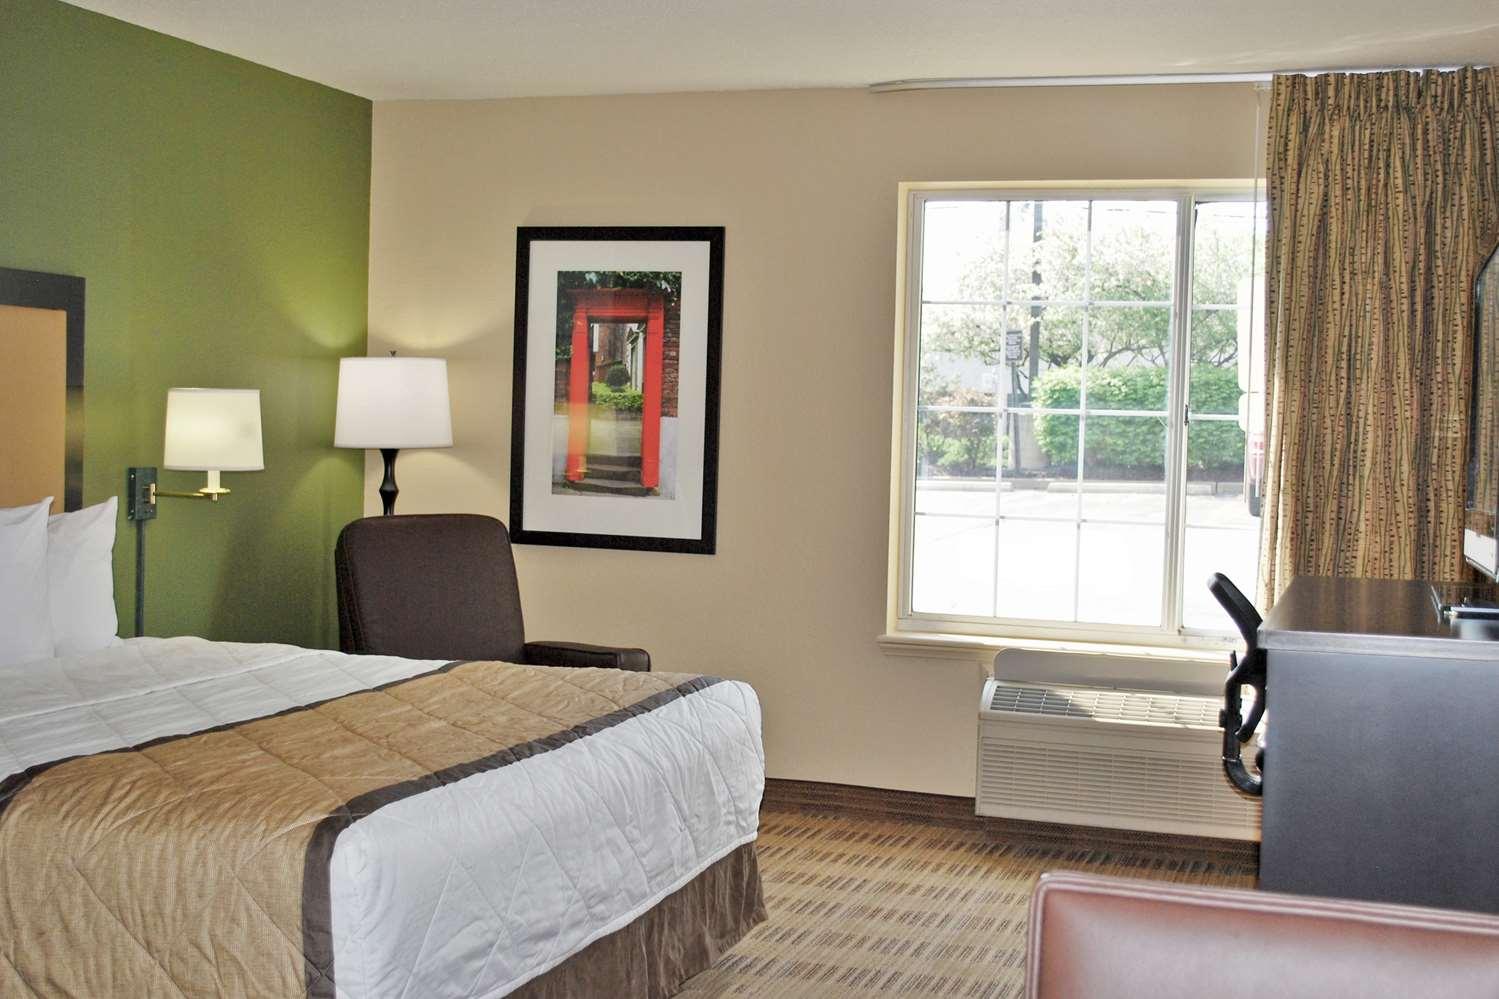 62093638 XXL - Extended Stay America Hotel Los Angeles South Gardena Ca